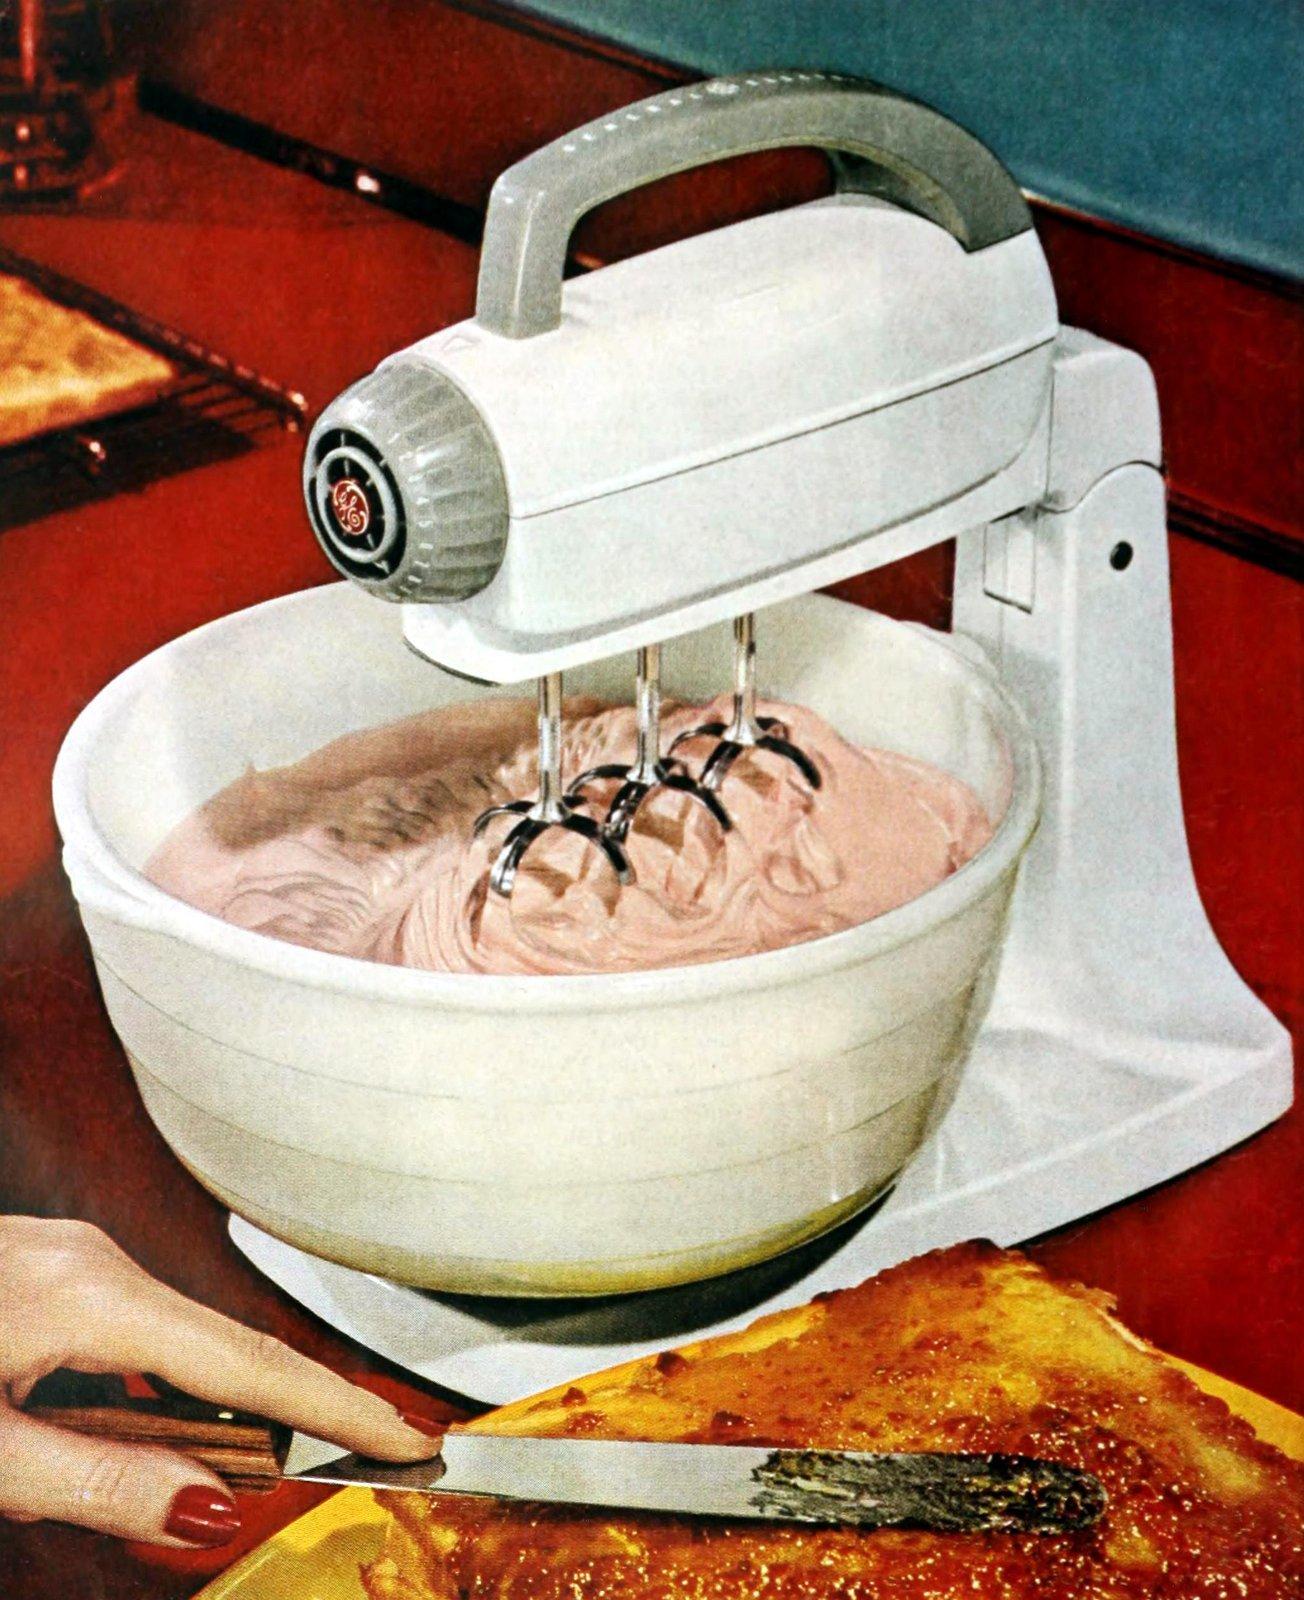 Retro table mixer in white